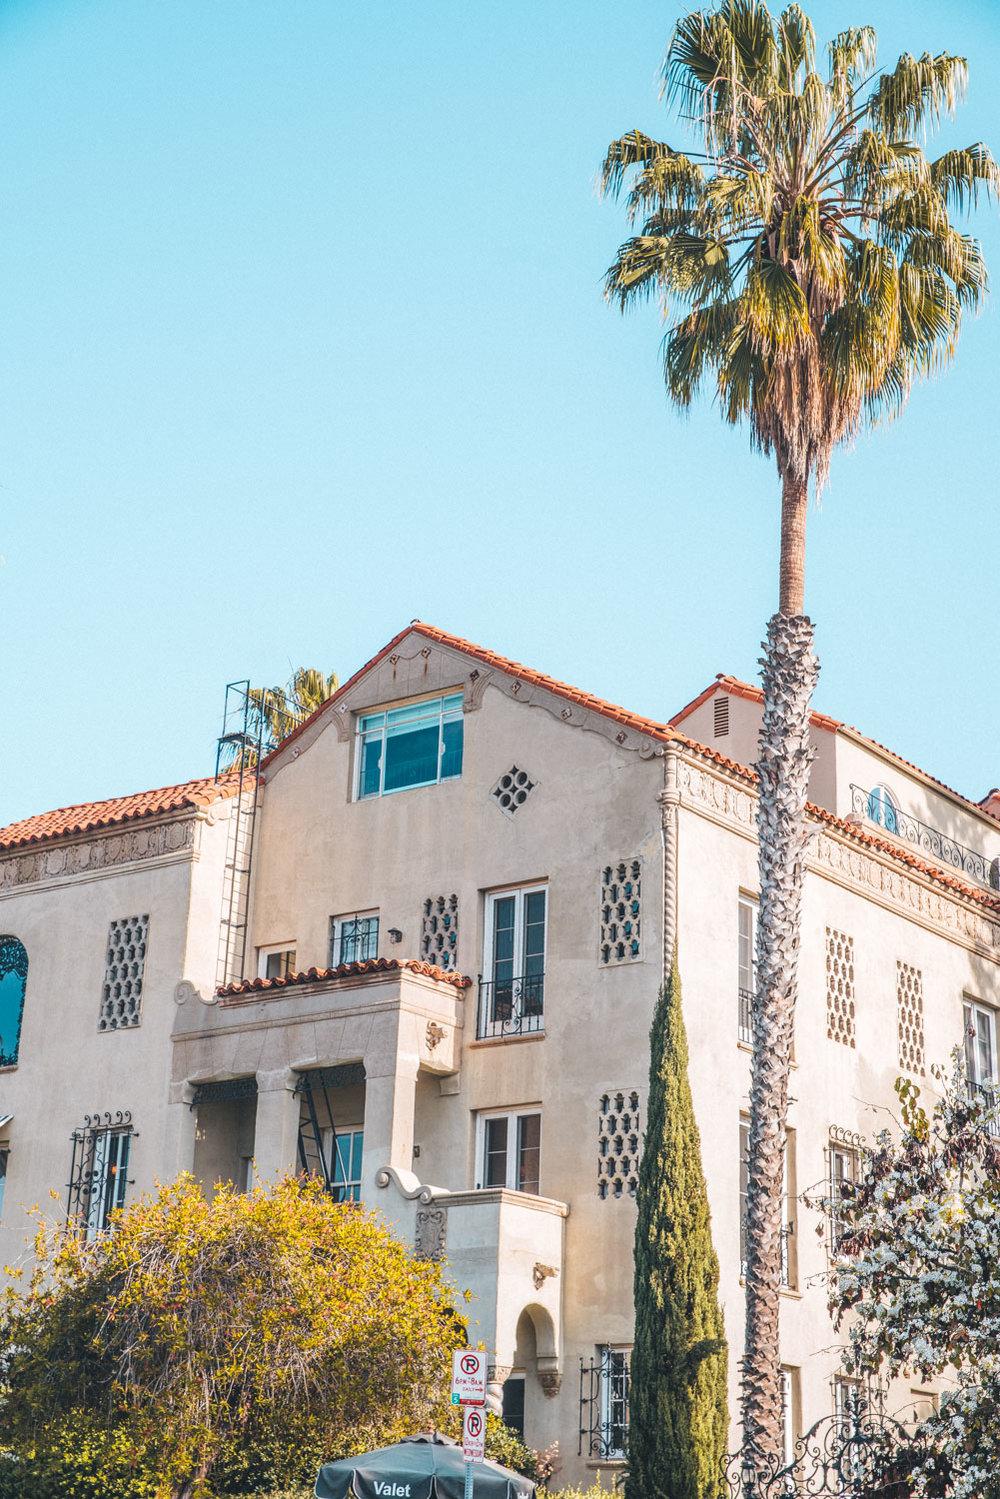 Palihouse Santa Monica with HotelTonight - by Madeline Lu-6.jpg